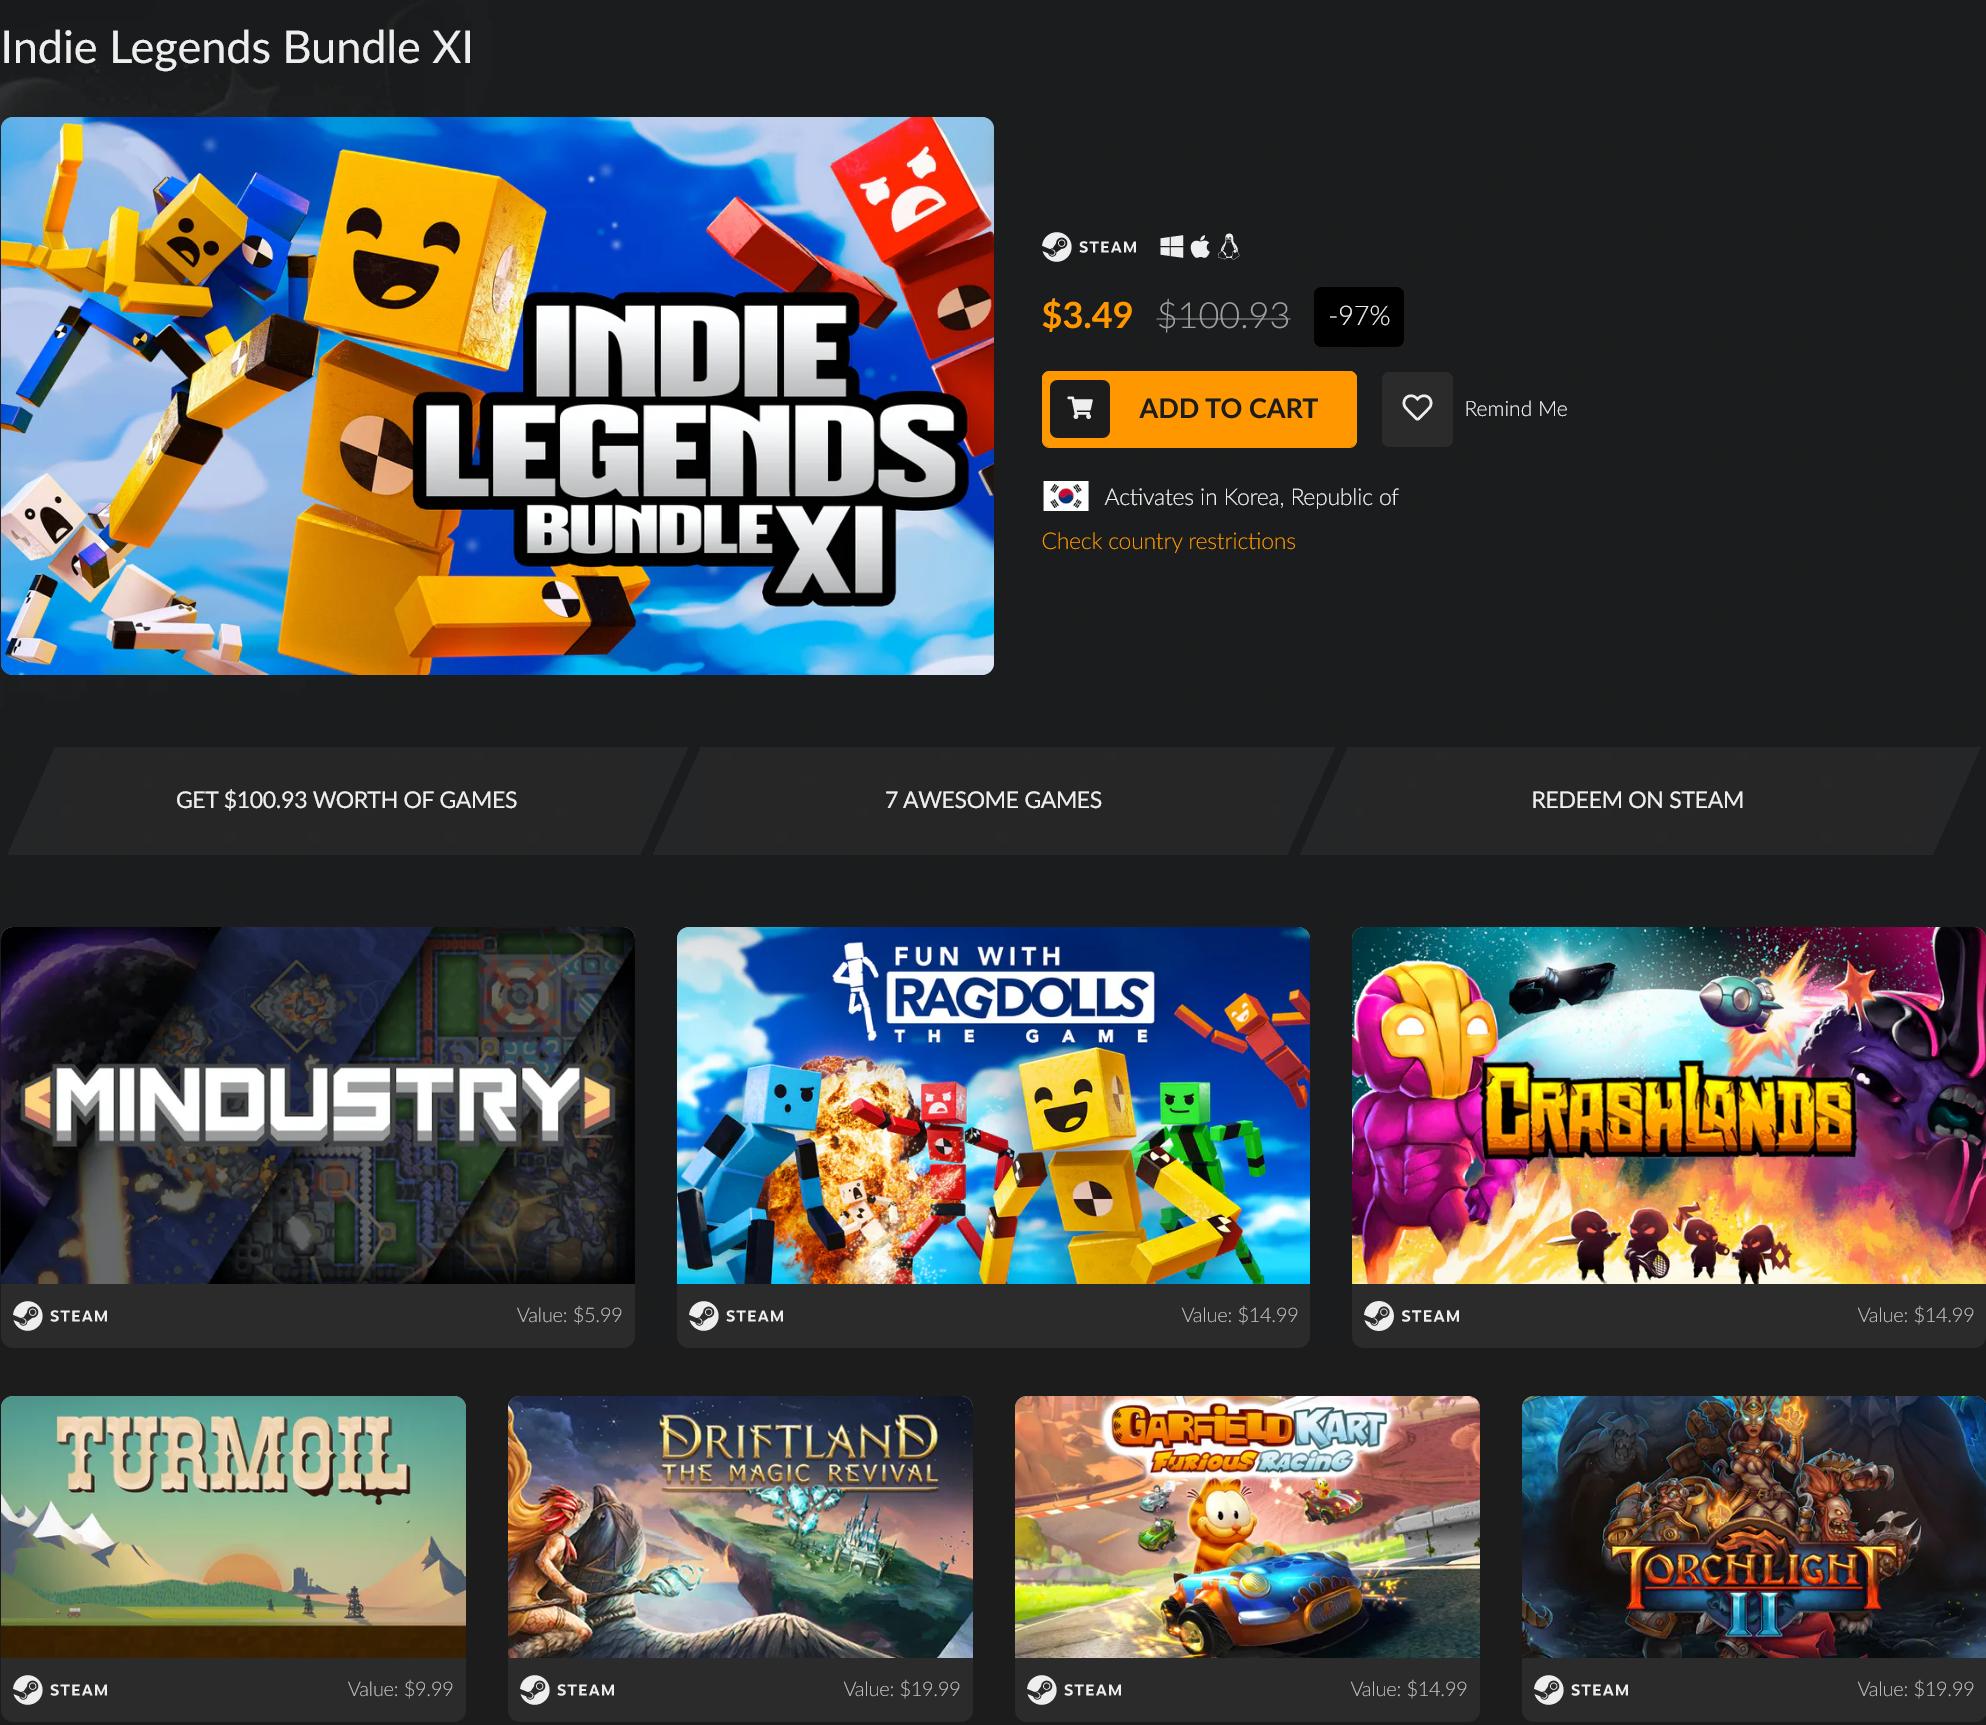 Screenshot 2021-08-21 at 02-33-59 Indie Legends Bundle XI Steam Game Bundle Fanatical.png